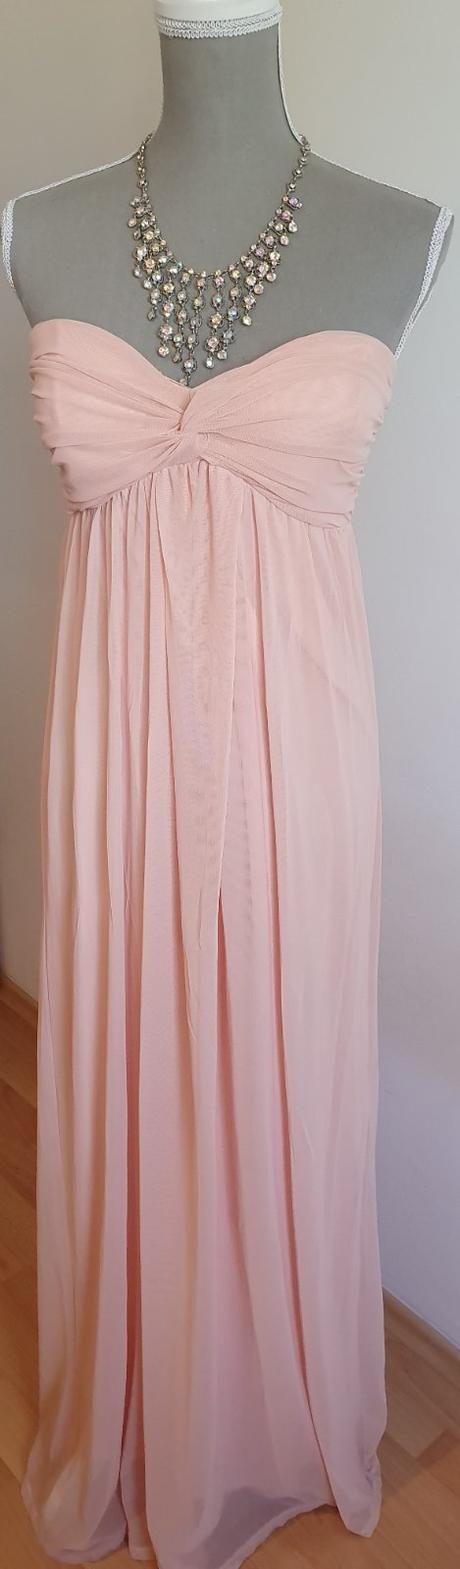 lahulinké šaty Tally Weijl - Obrázok č. 2